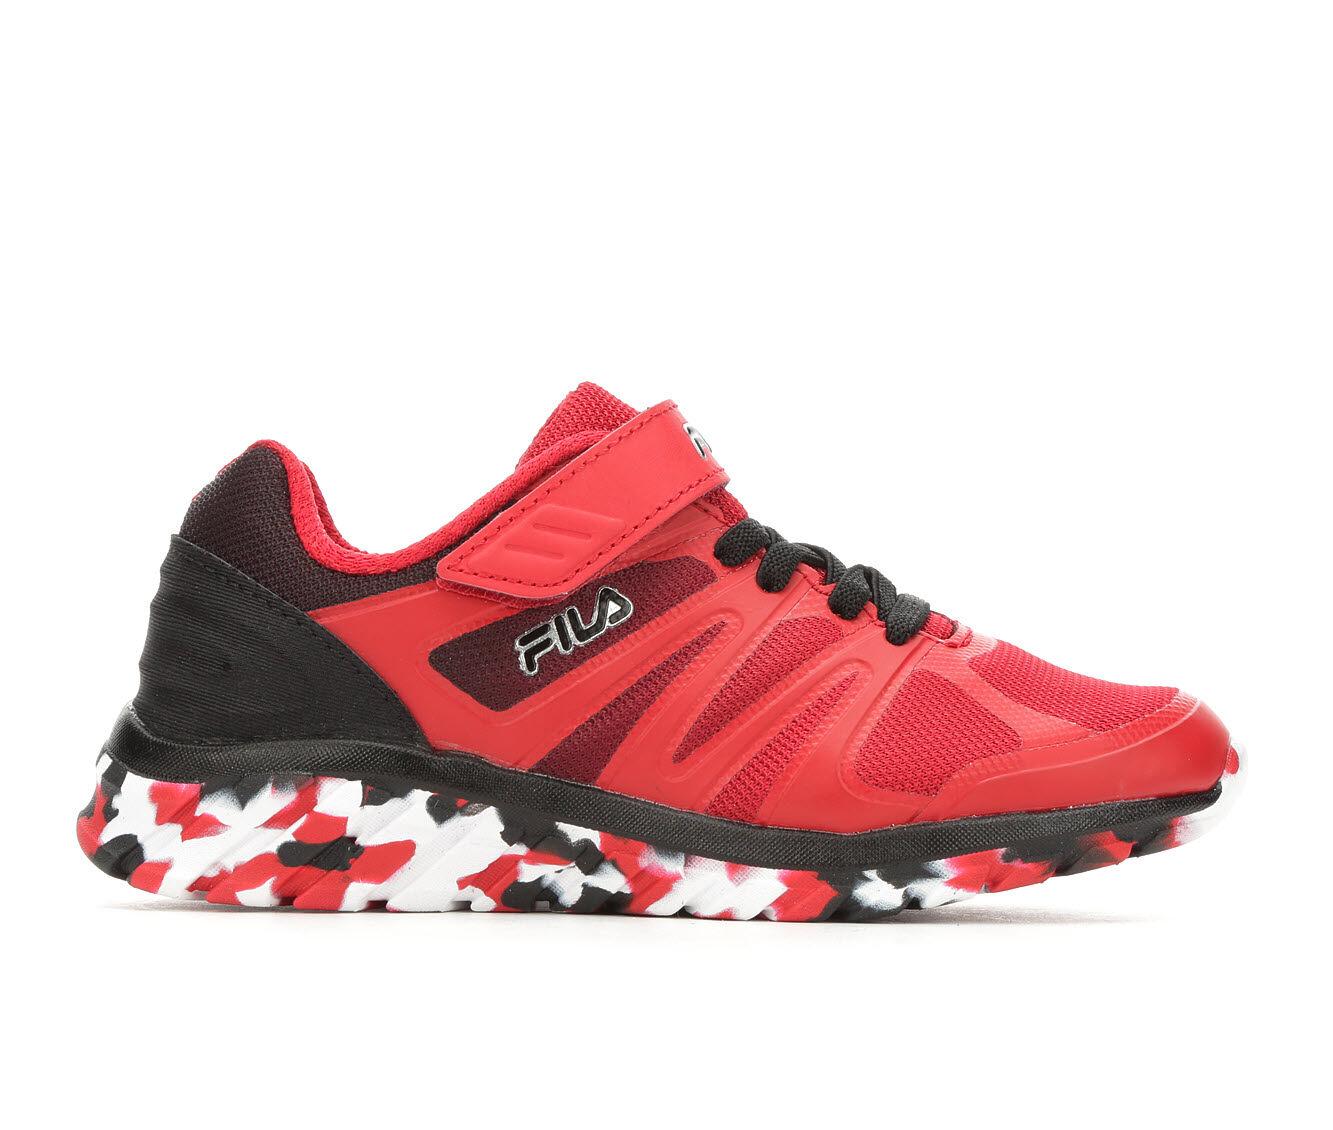 Boys' Fila Little Kid & Big Kid Cryptonic 3 Strap Running Shoes